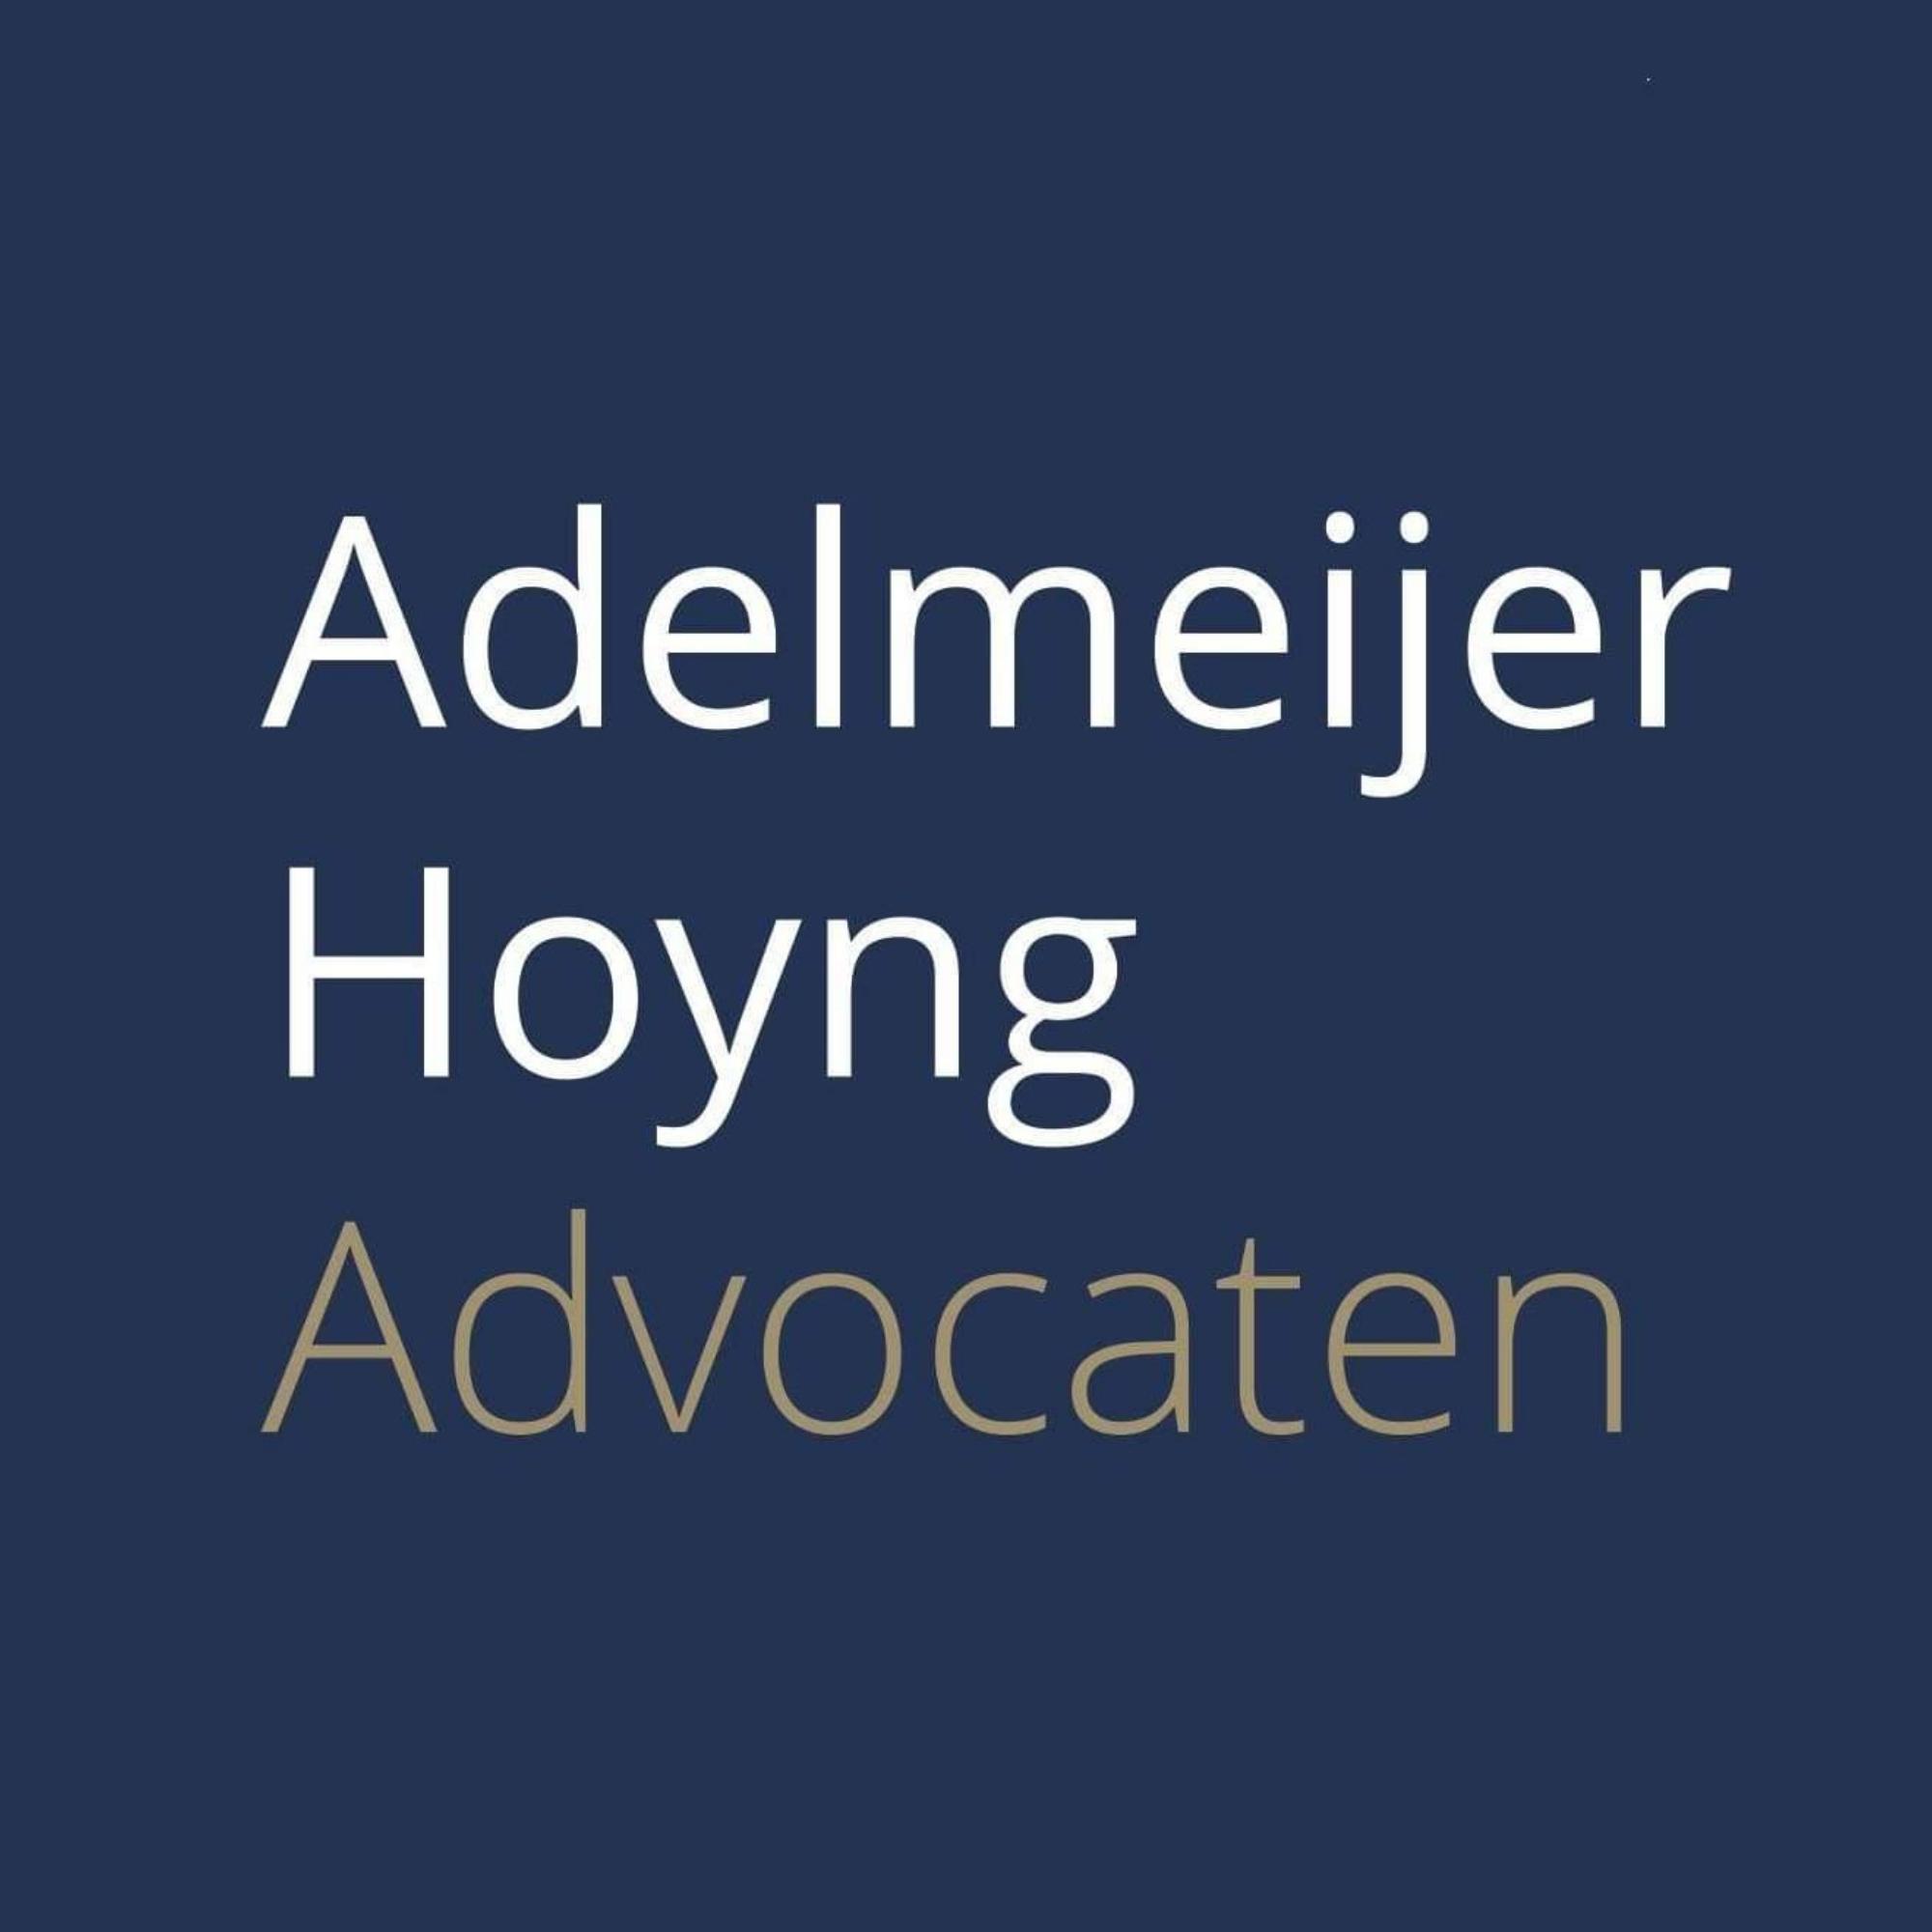 Adelmeijer Hoyng advocaten